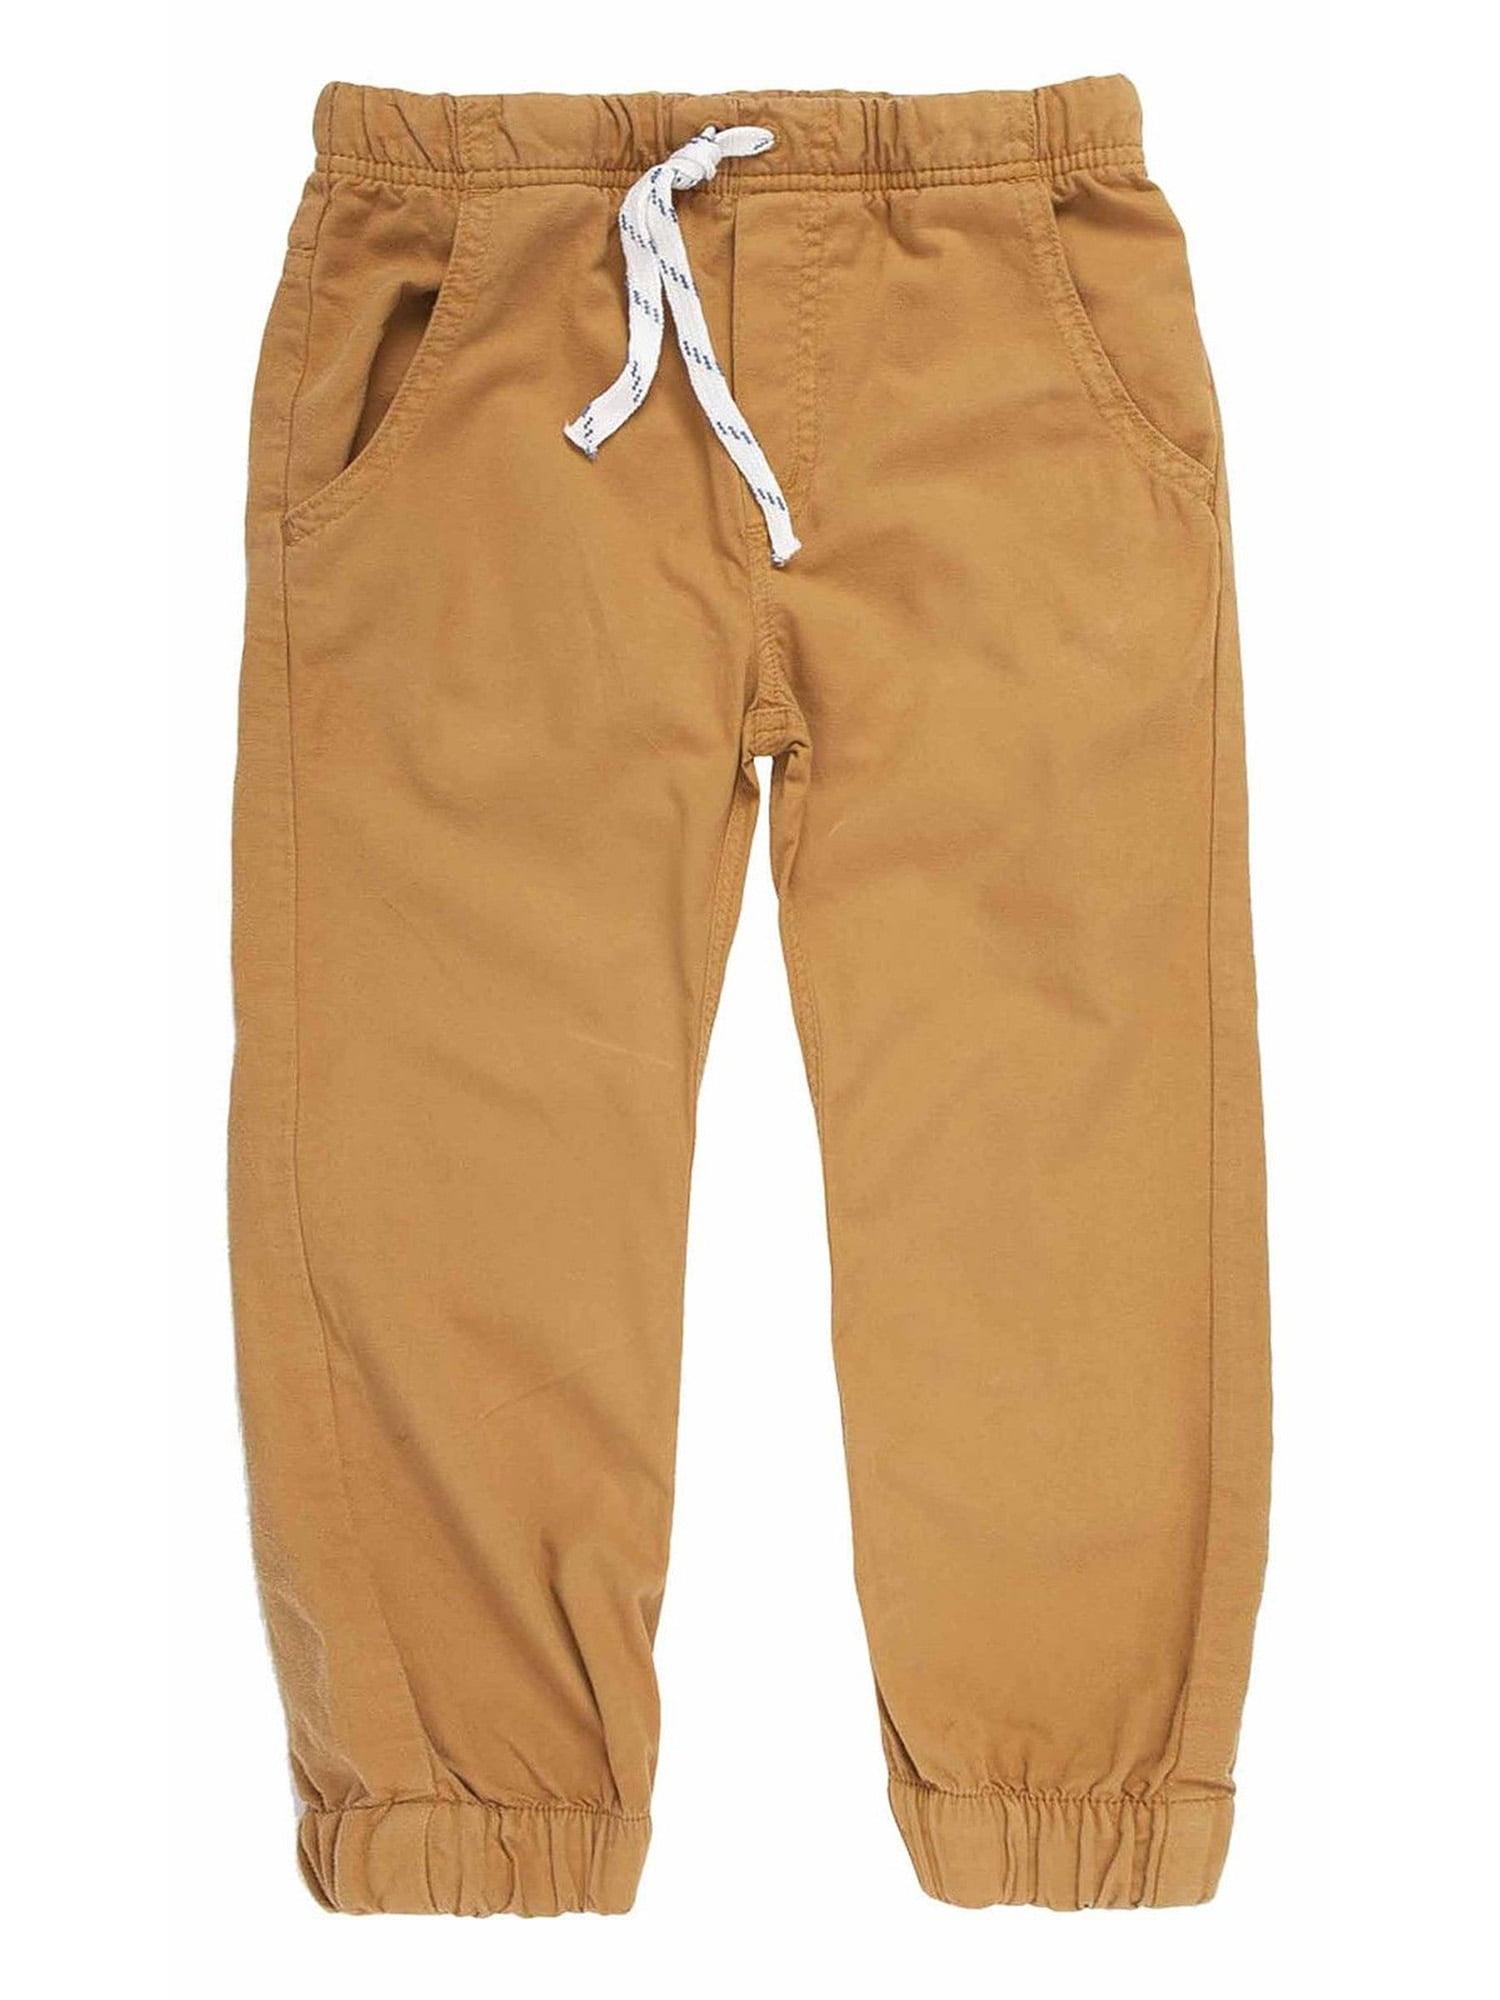 OFFCORSS Toddler Boy Cotton T-Shirt Conjuntos de Ni/ños Jogger Pants Set